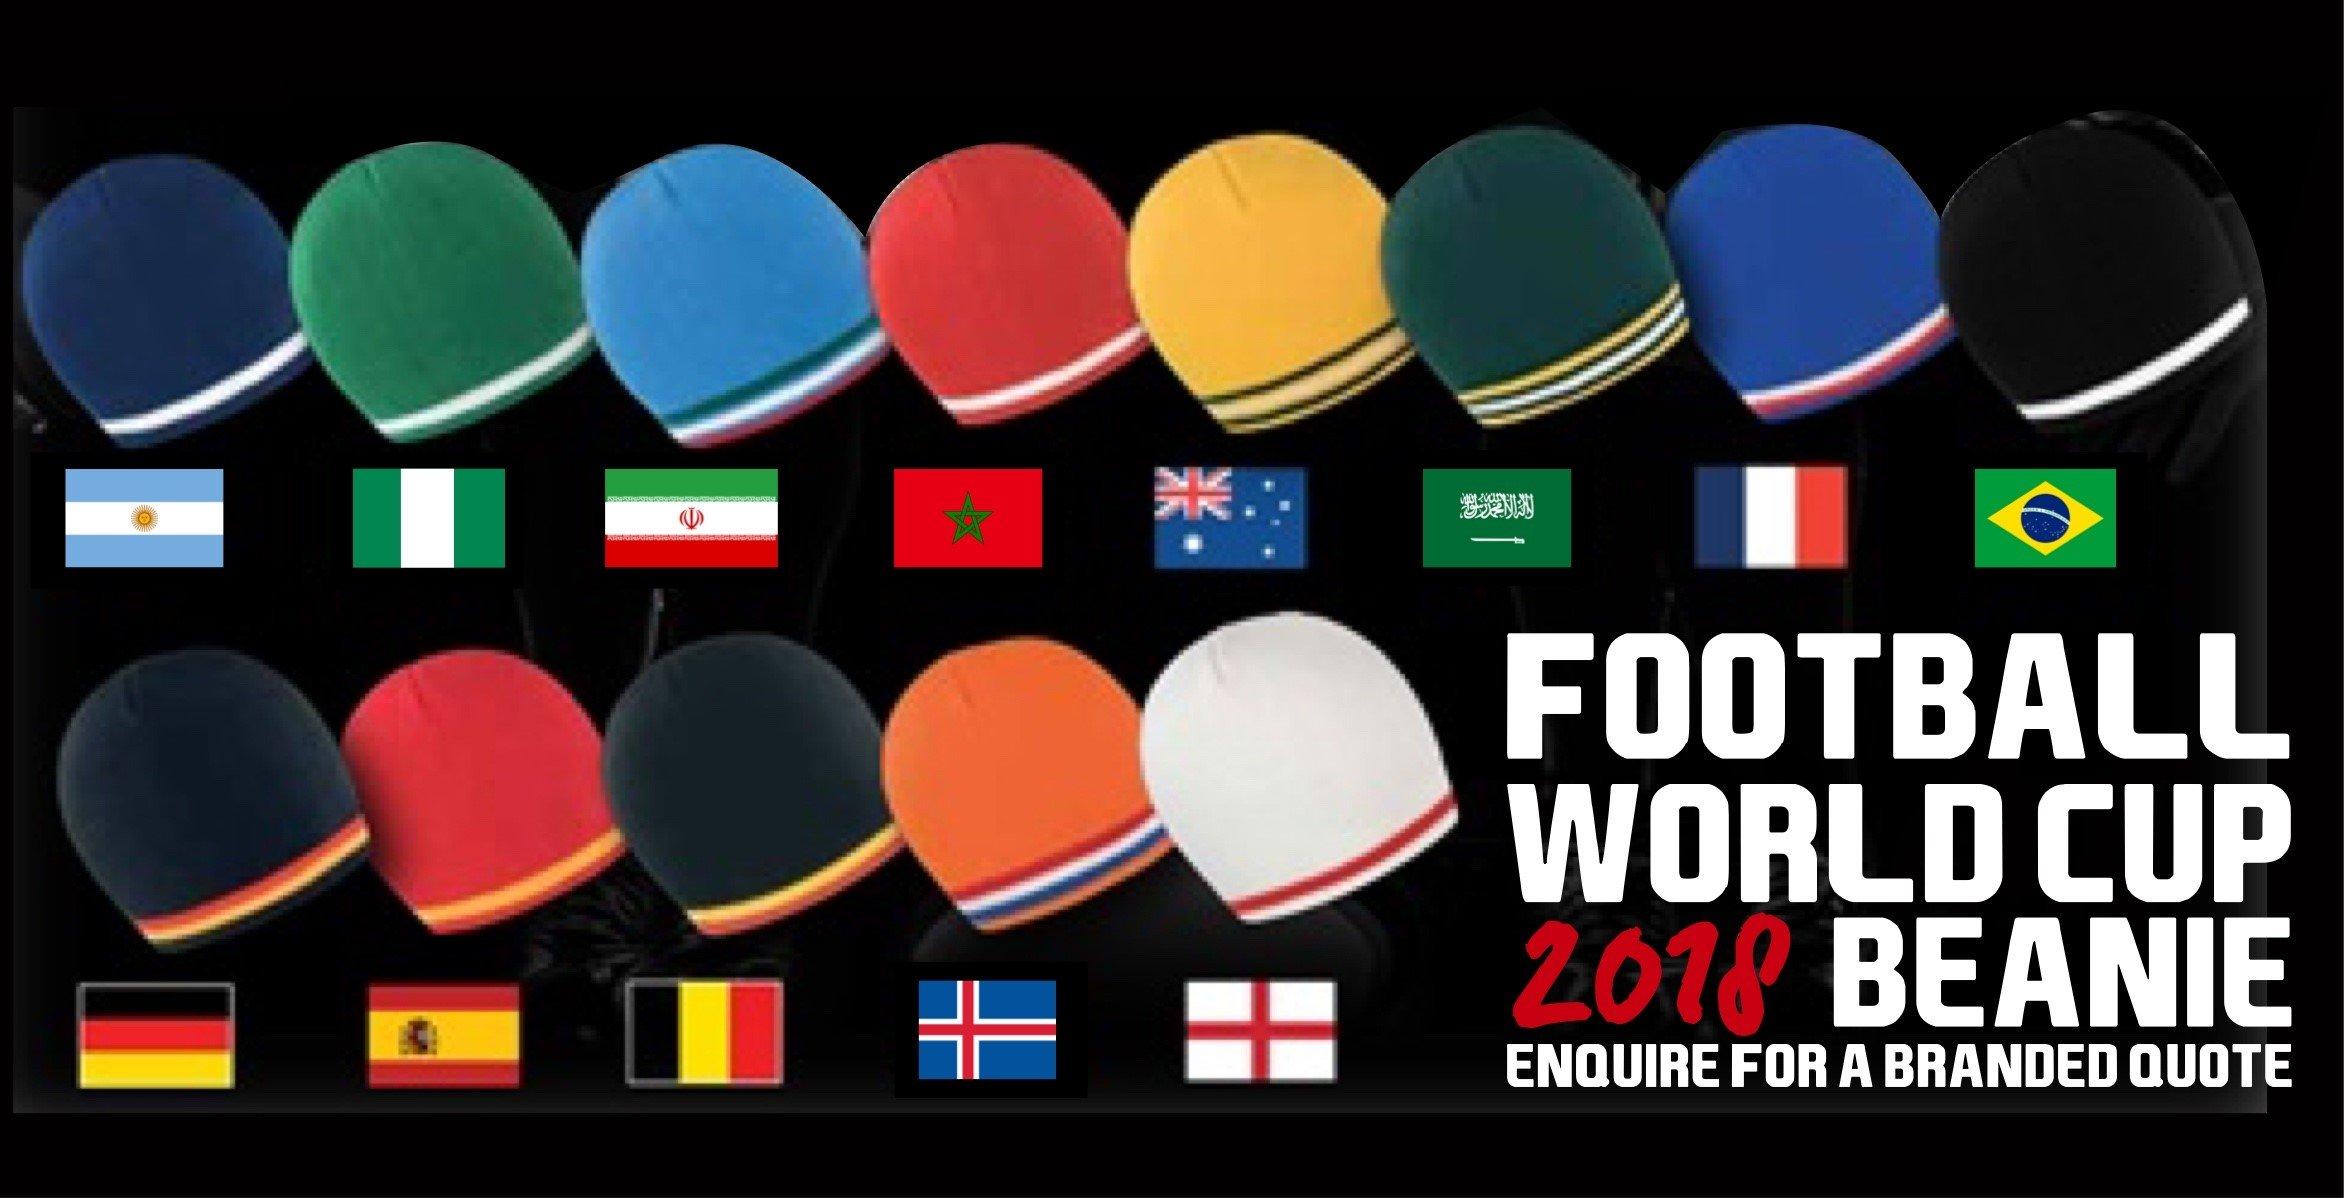 World Cup Beanies